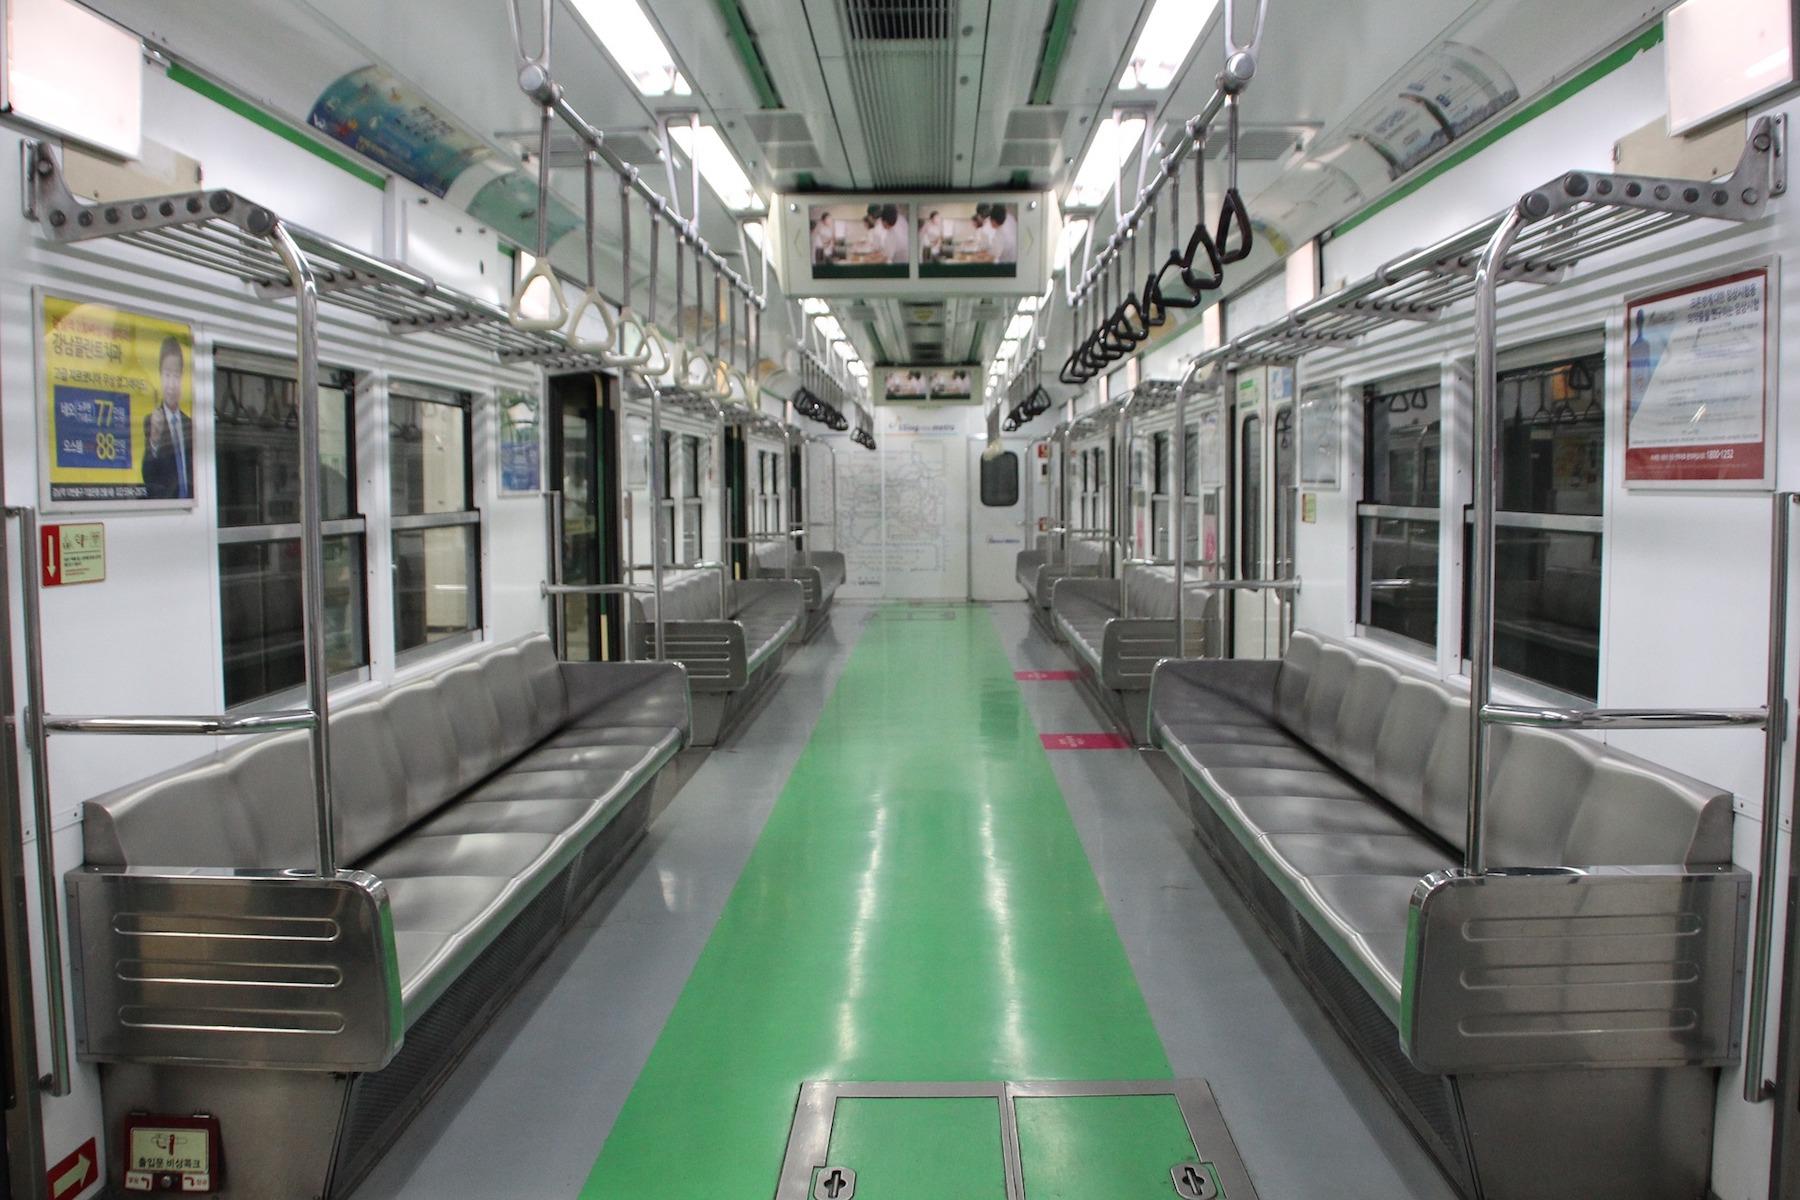 subway-2599123 1920